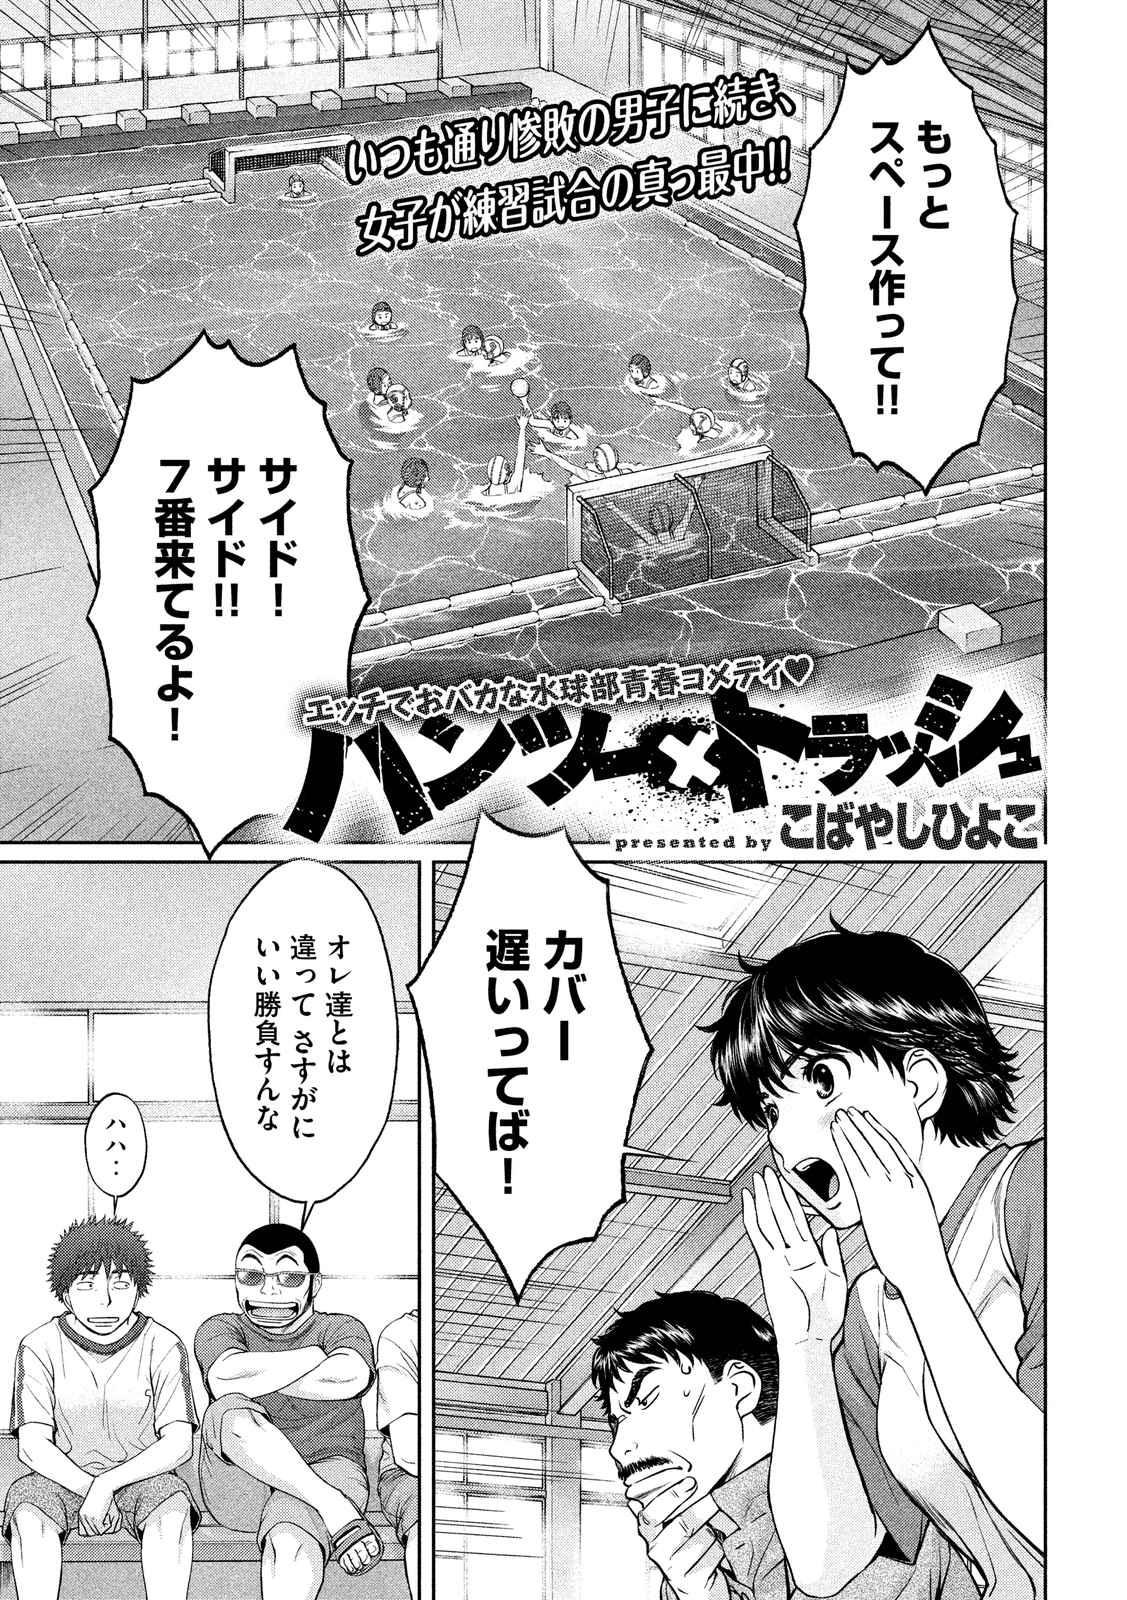 Hantsu_x_Trash Chapter 125 Page 1